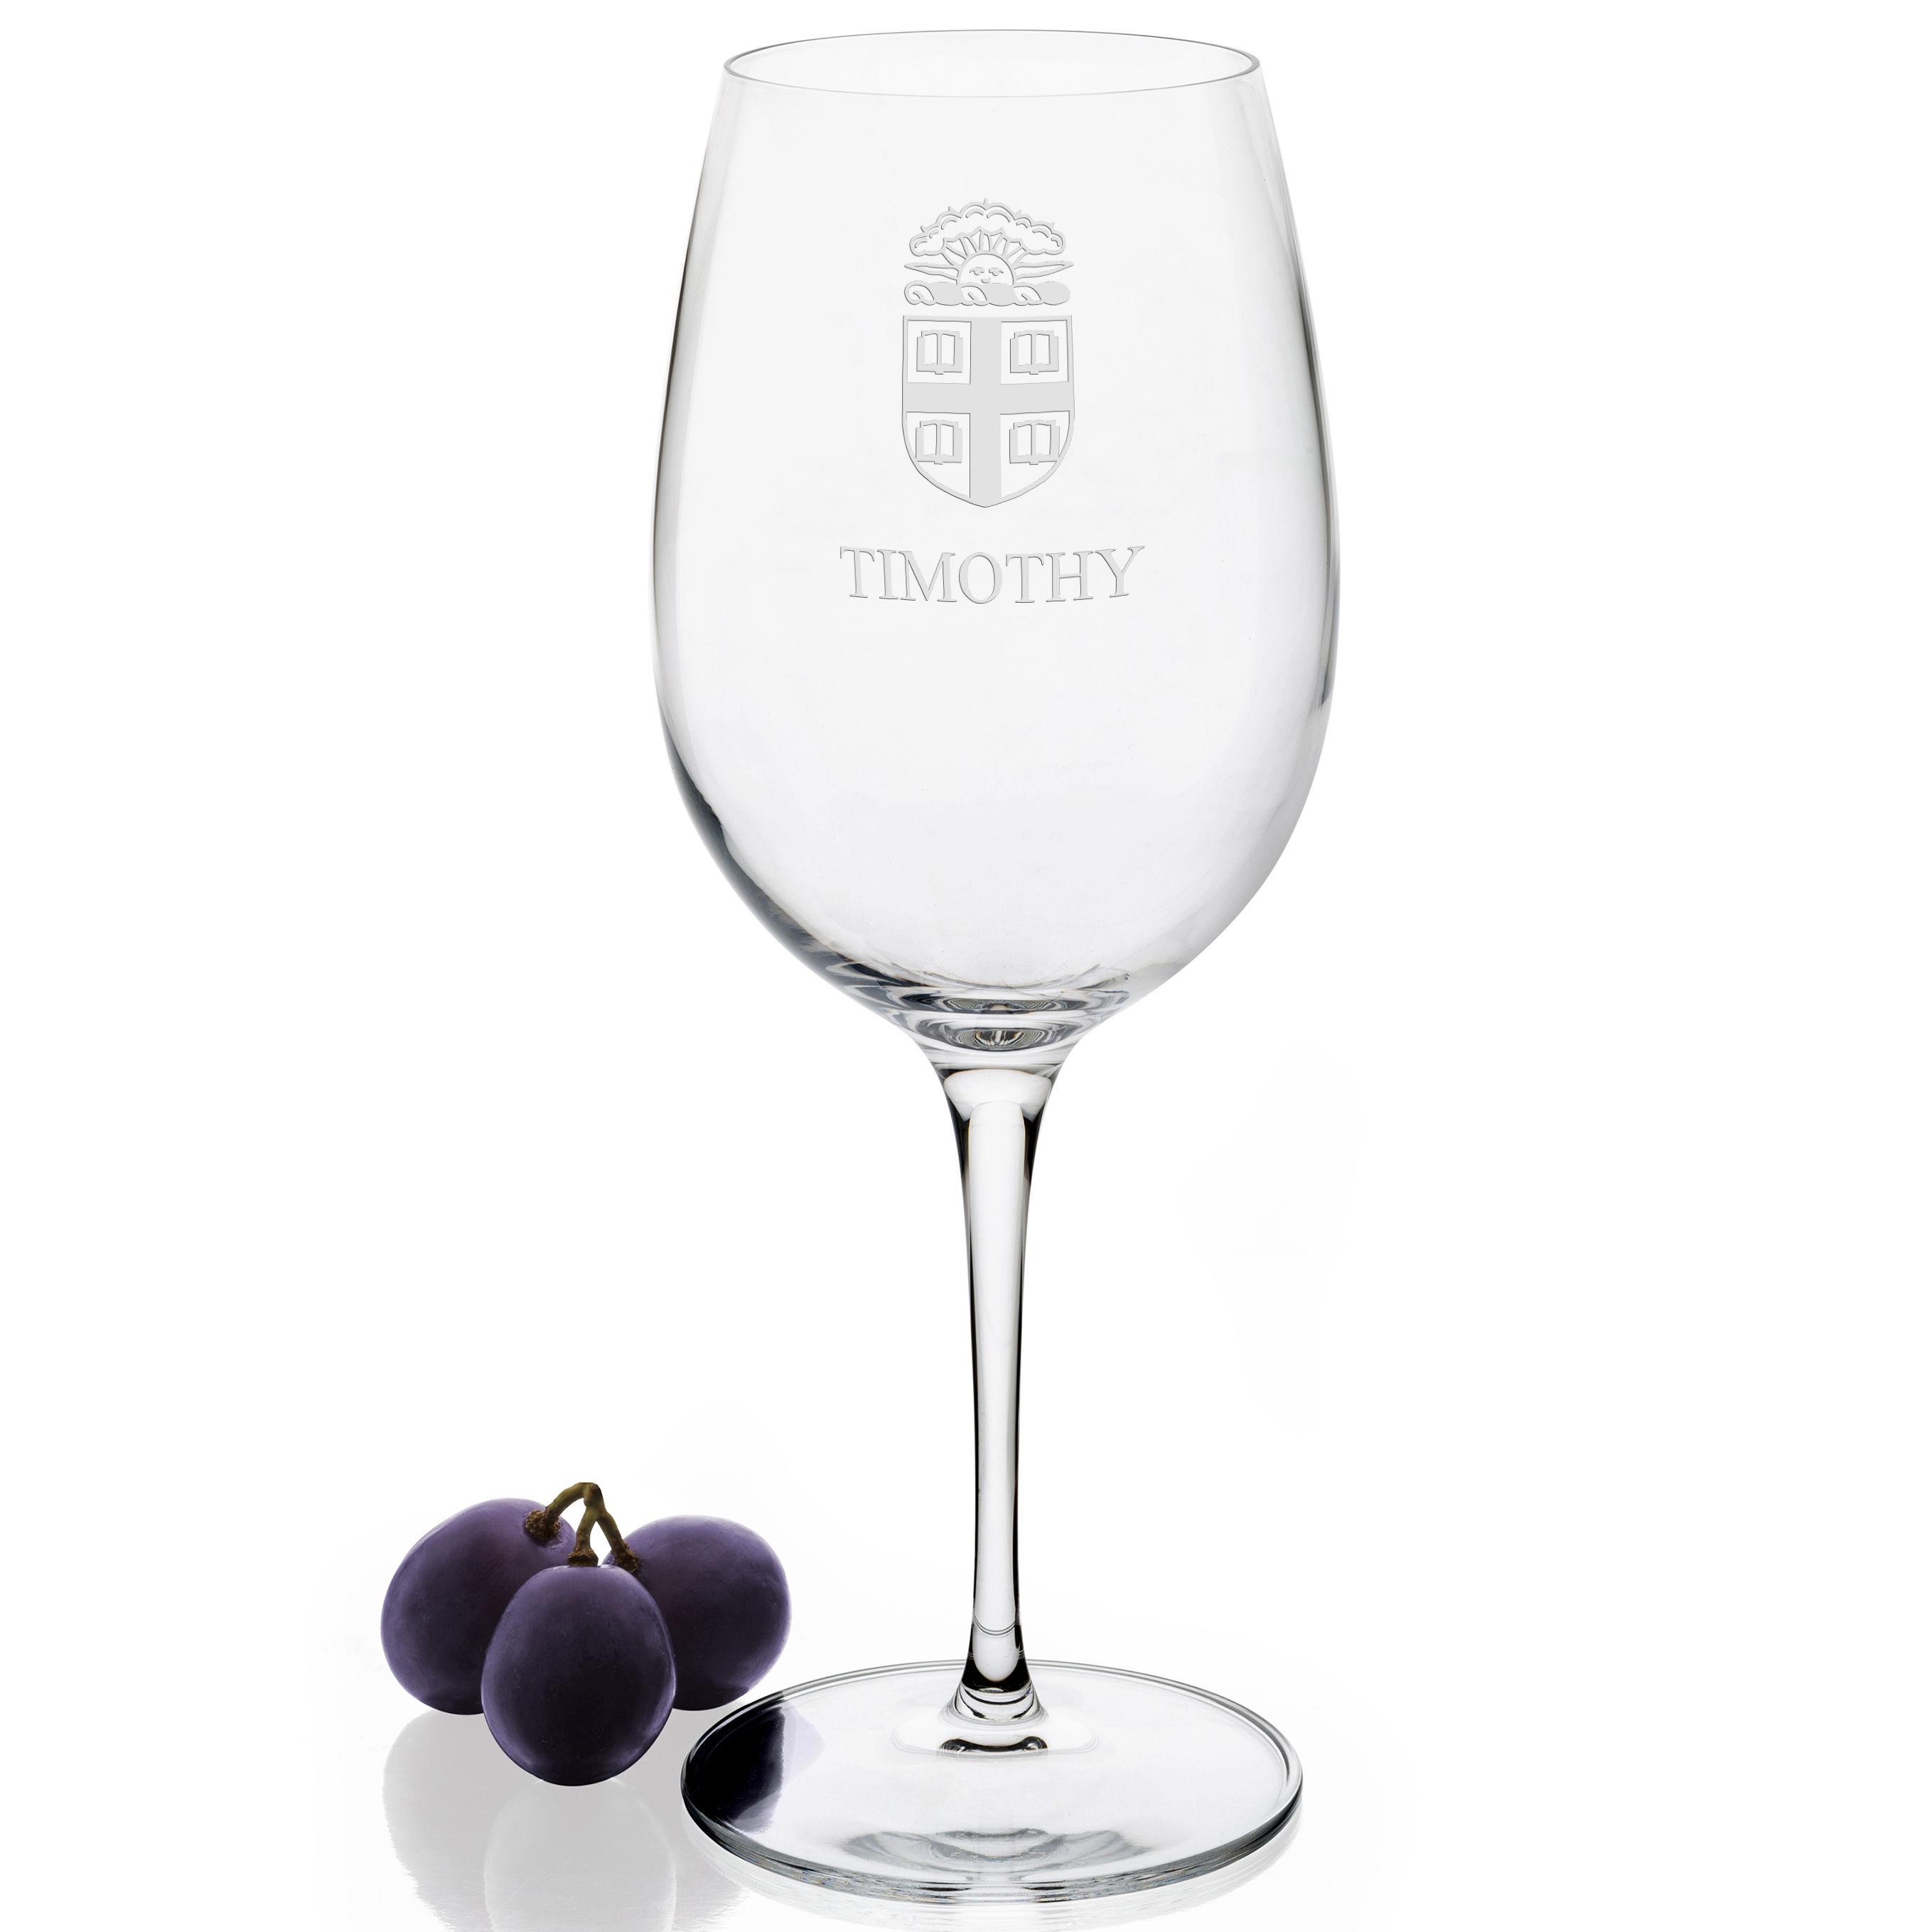 Brown University Red Wine Glasses - Set of 2 - Image 2